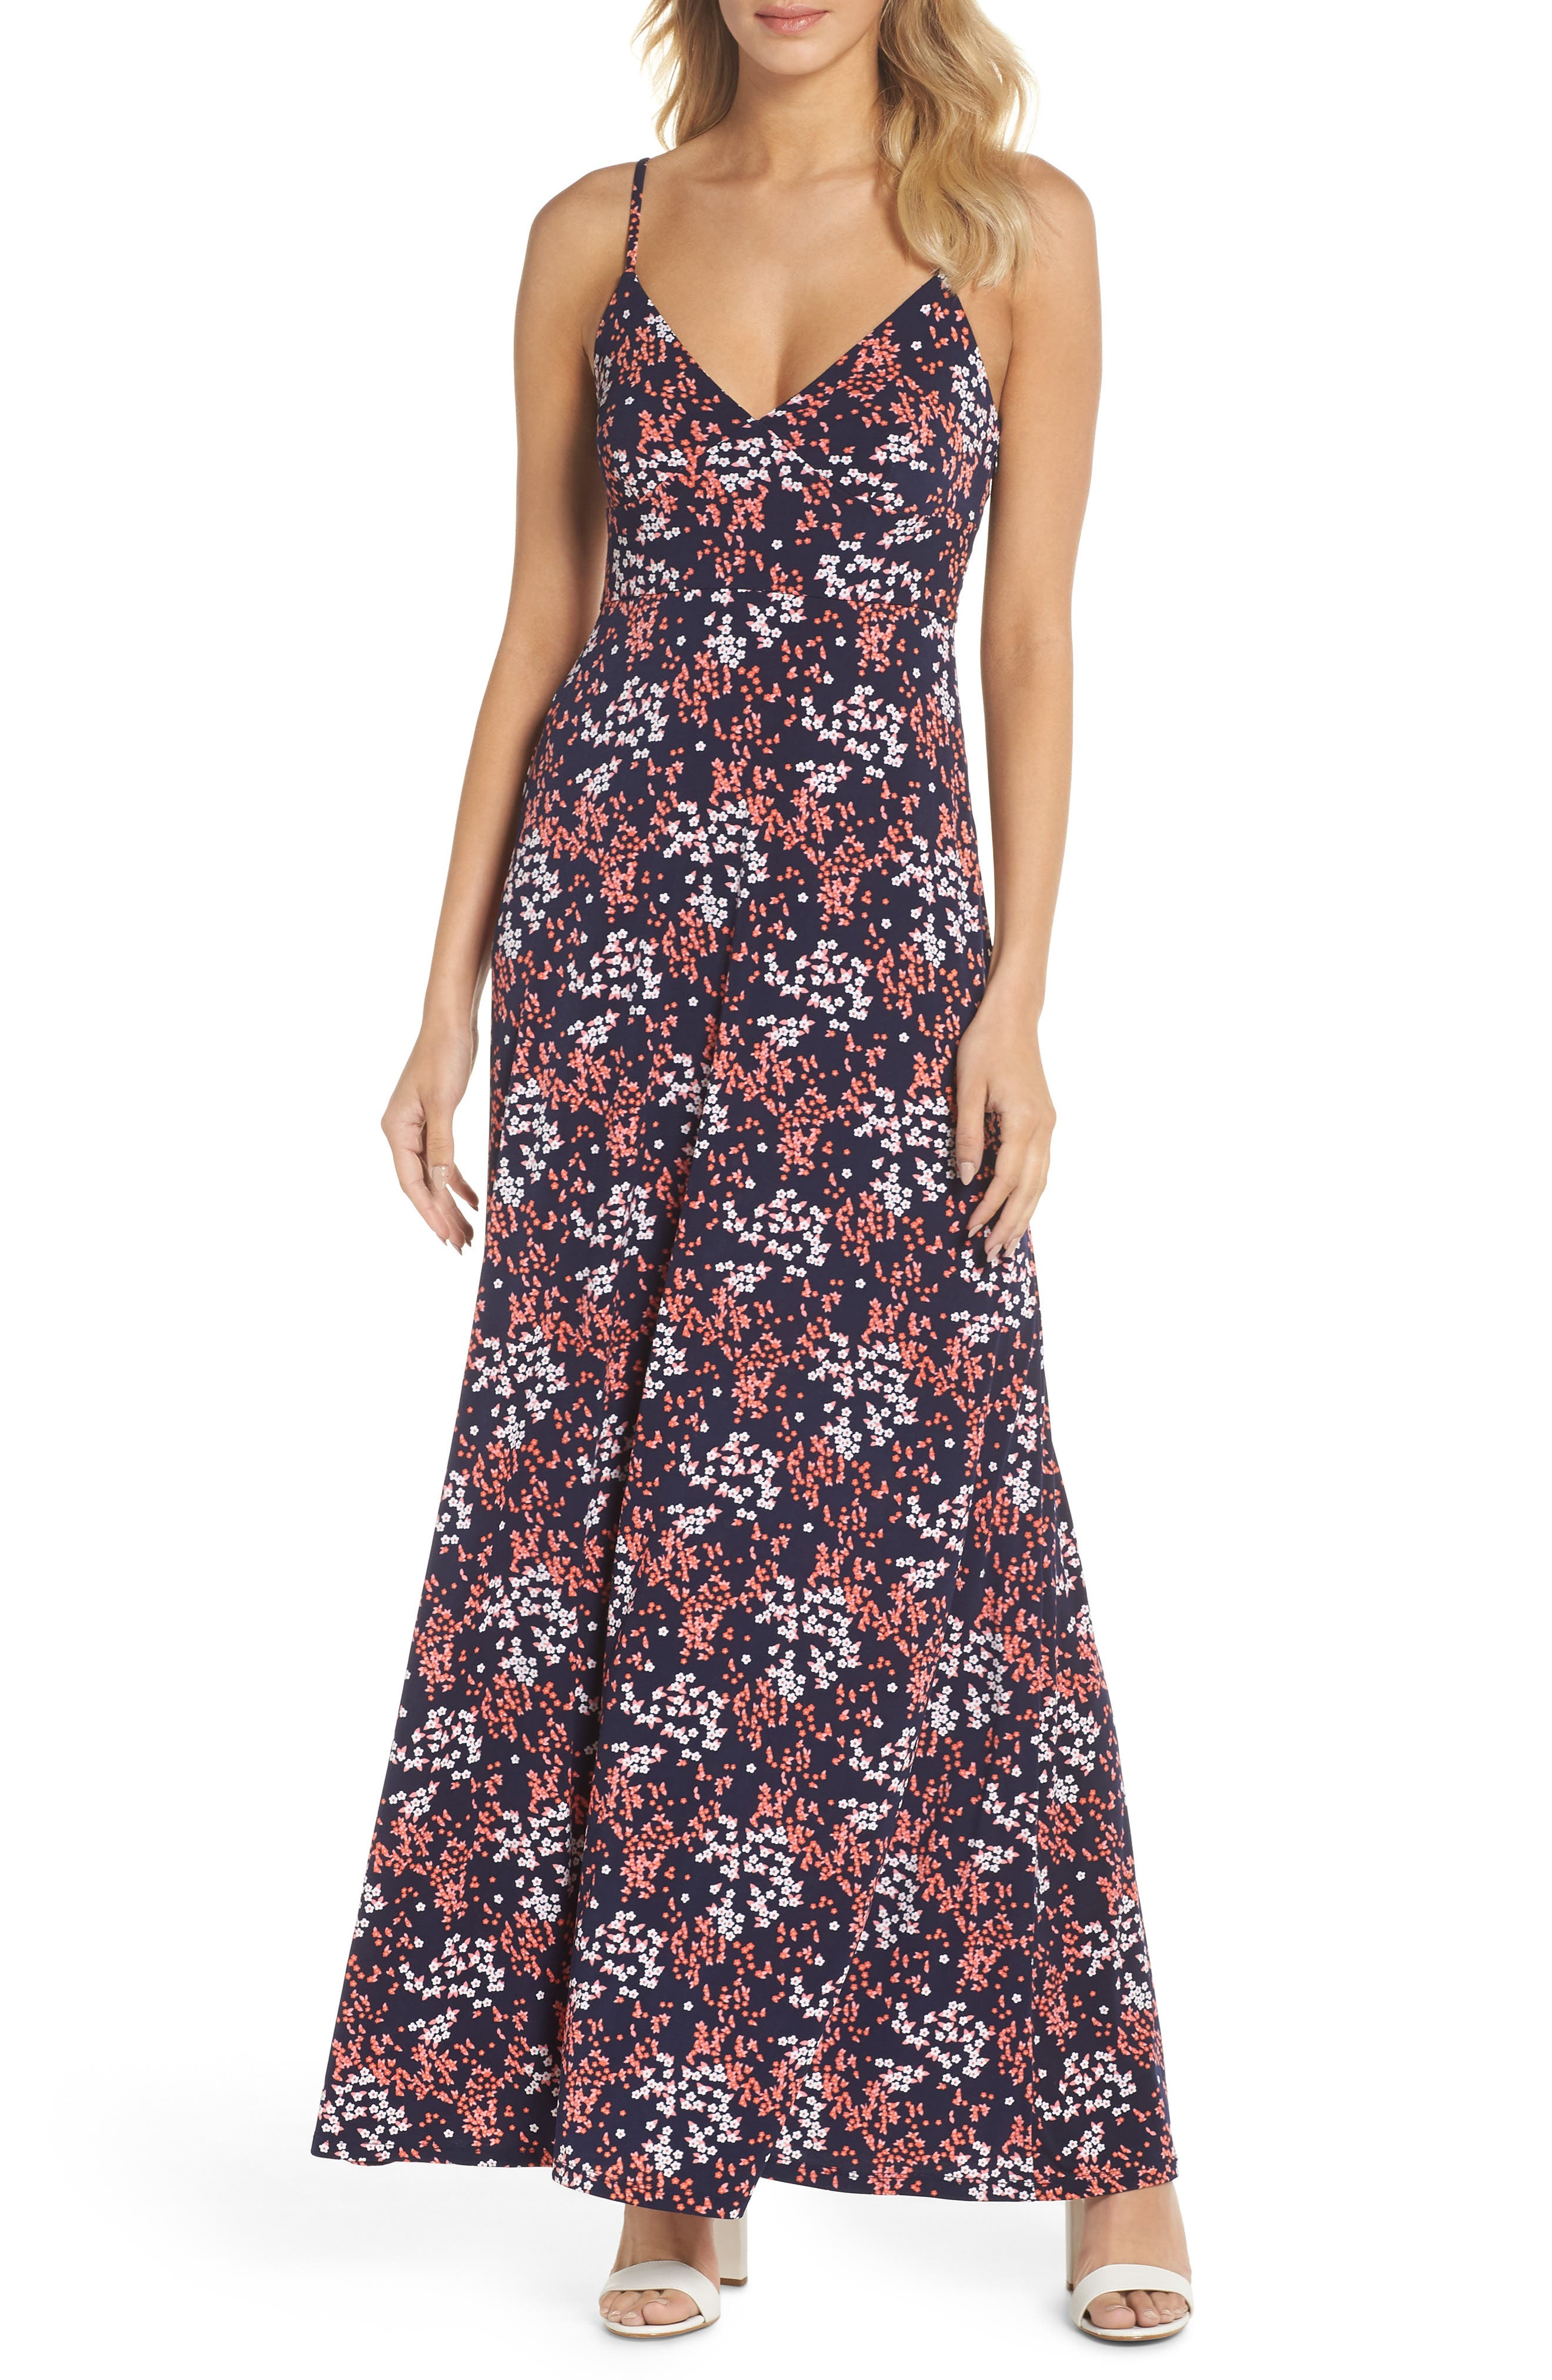 Bloom Maxi Dress,                         Main,                         color, True Navy/ Bight Blush